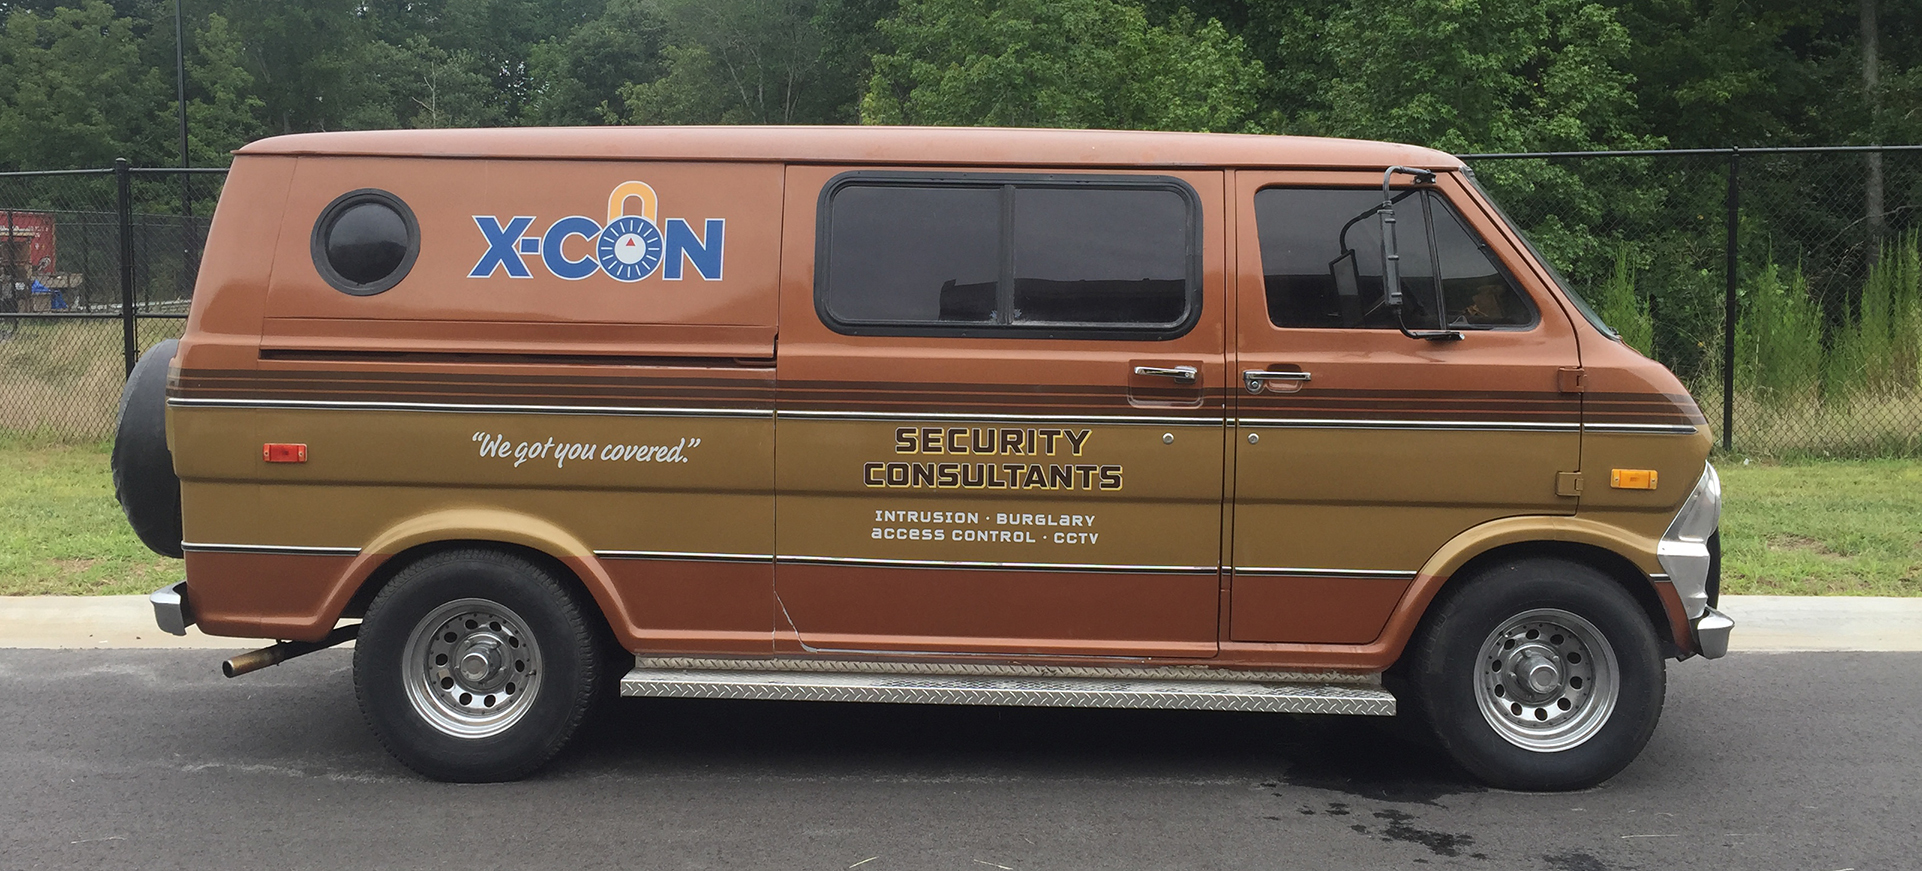 X-Con Van